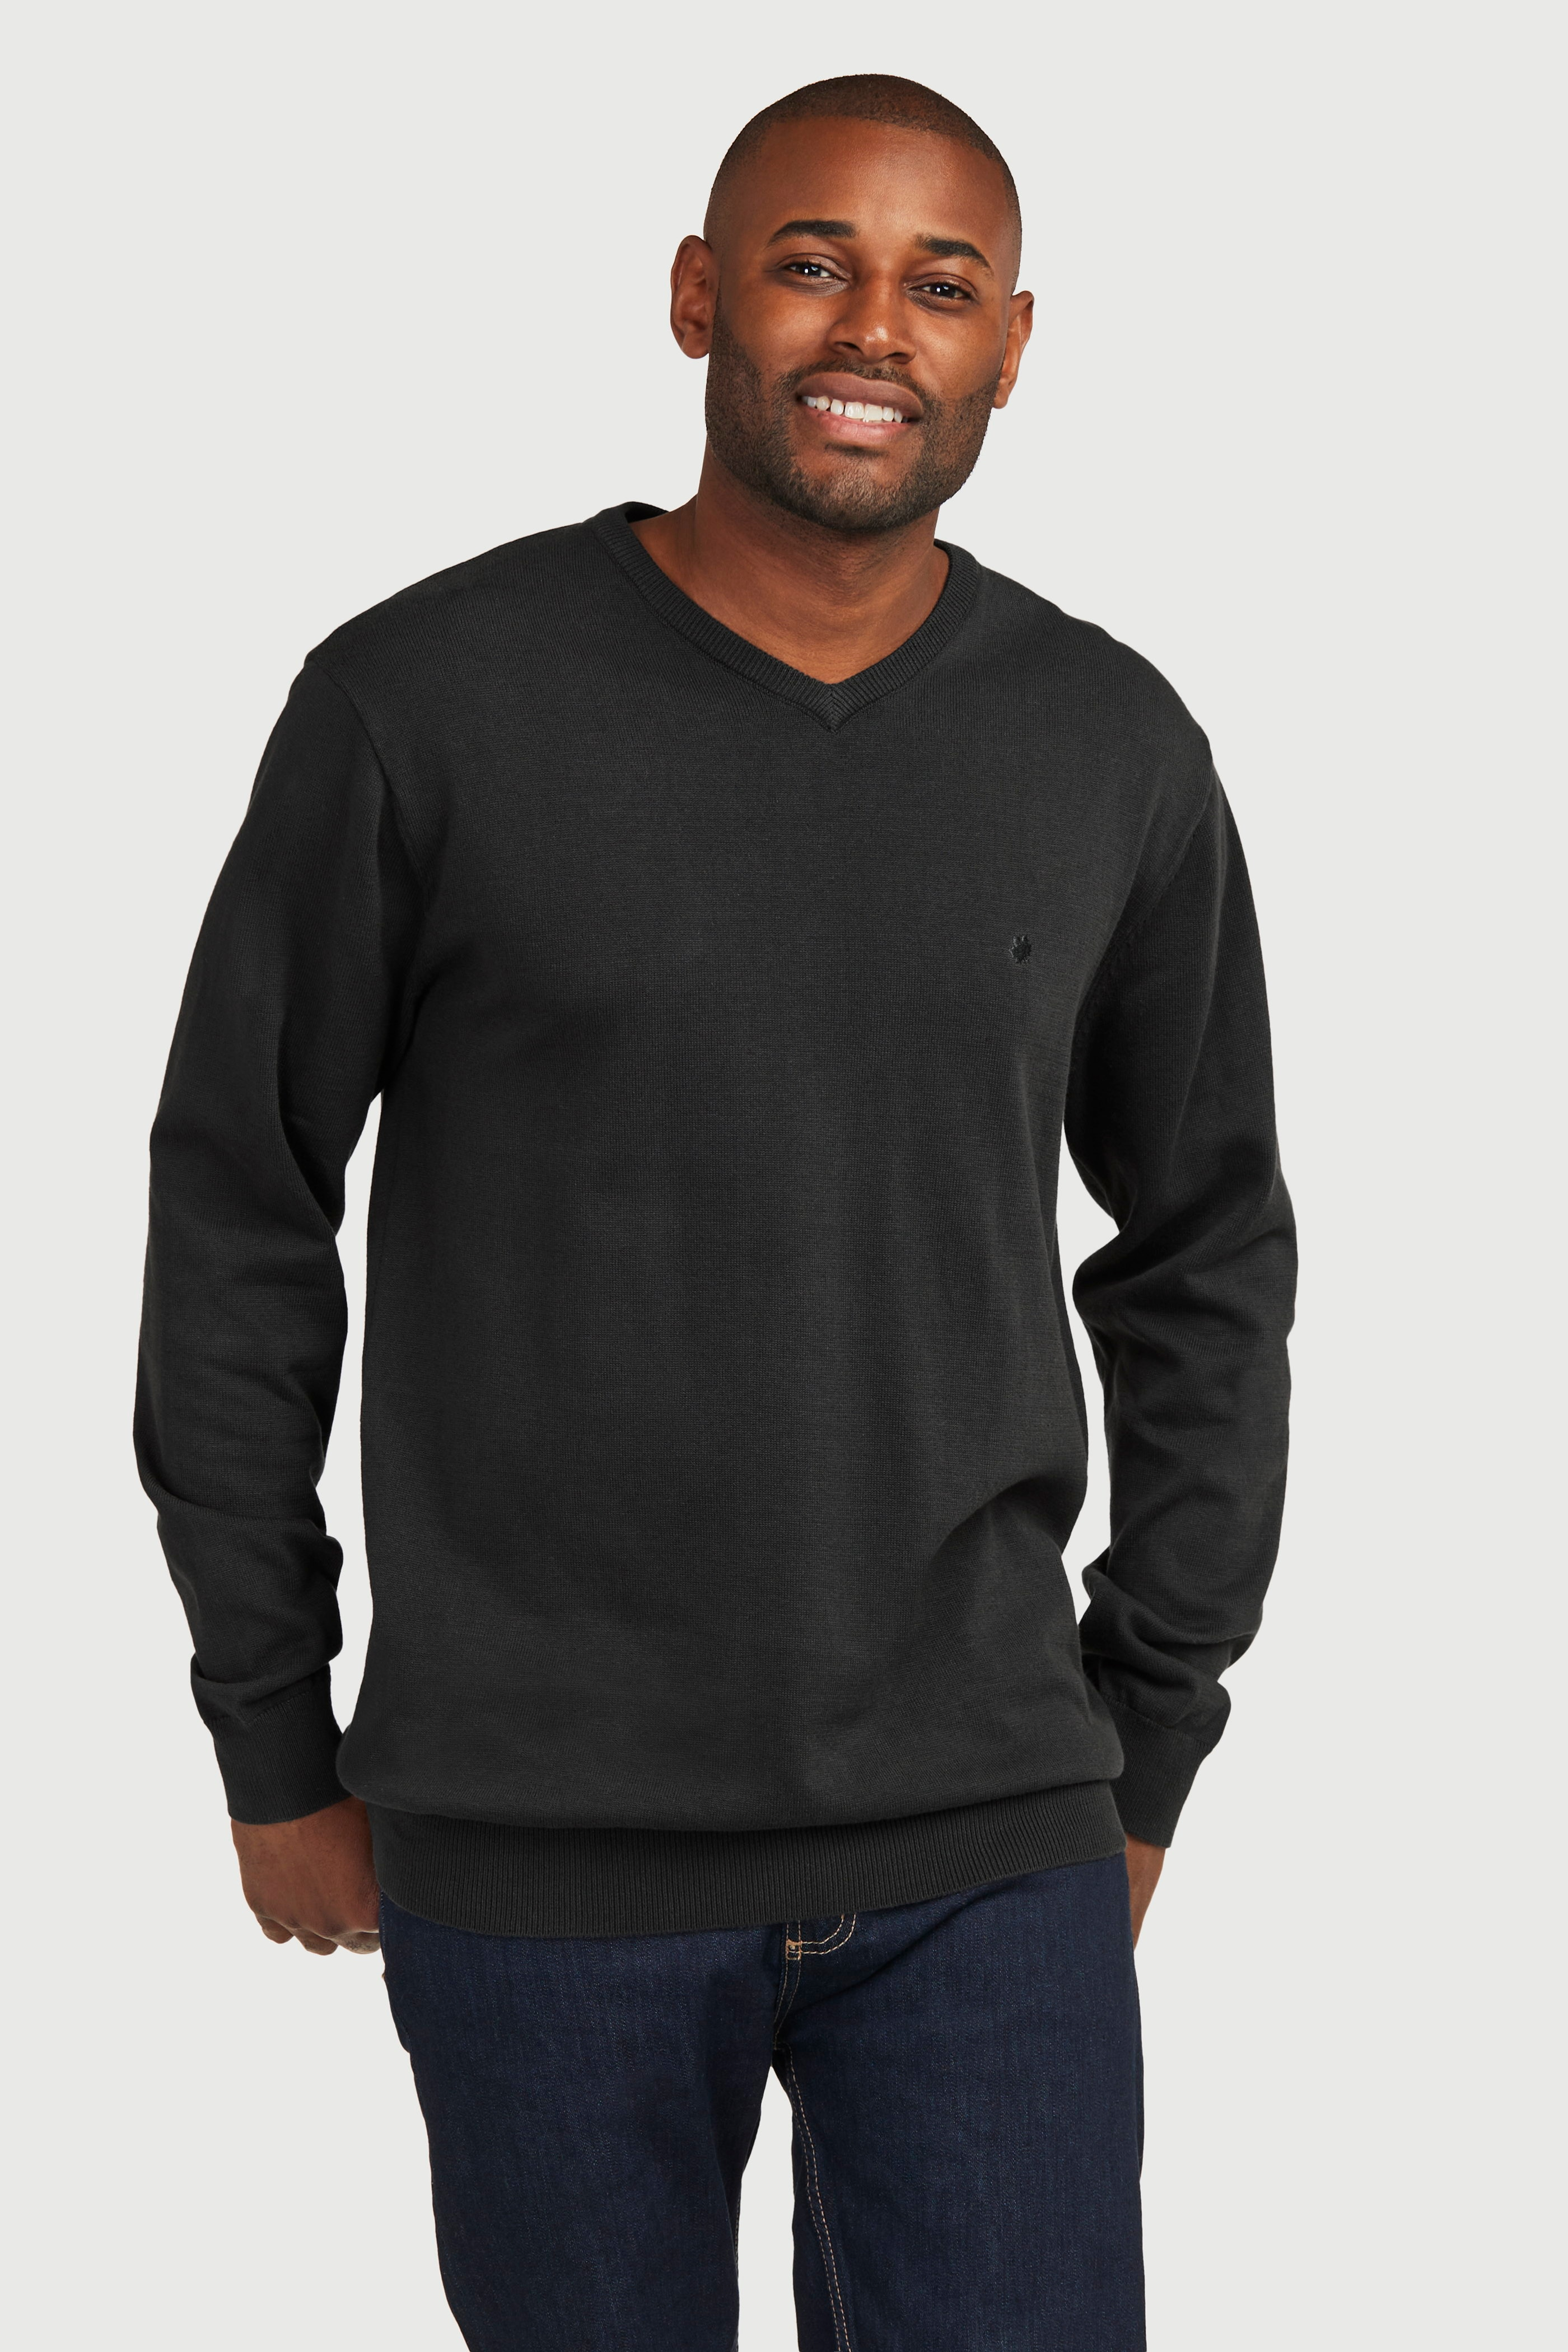 Pikkade varrukate ja V-kaelusega džemper